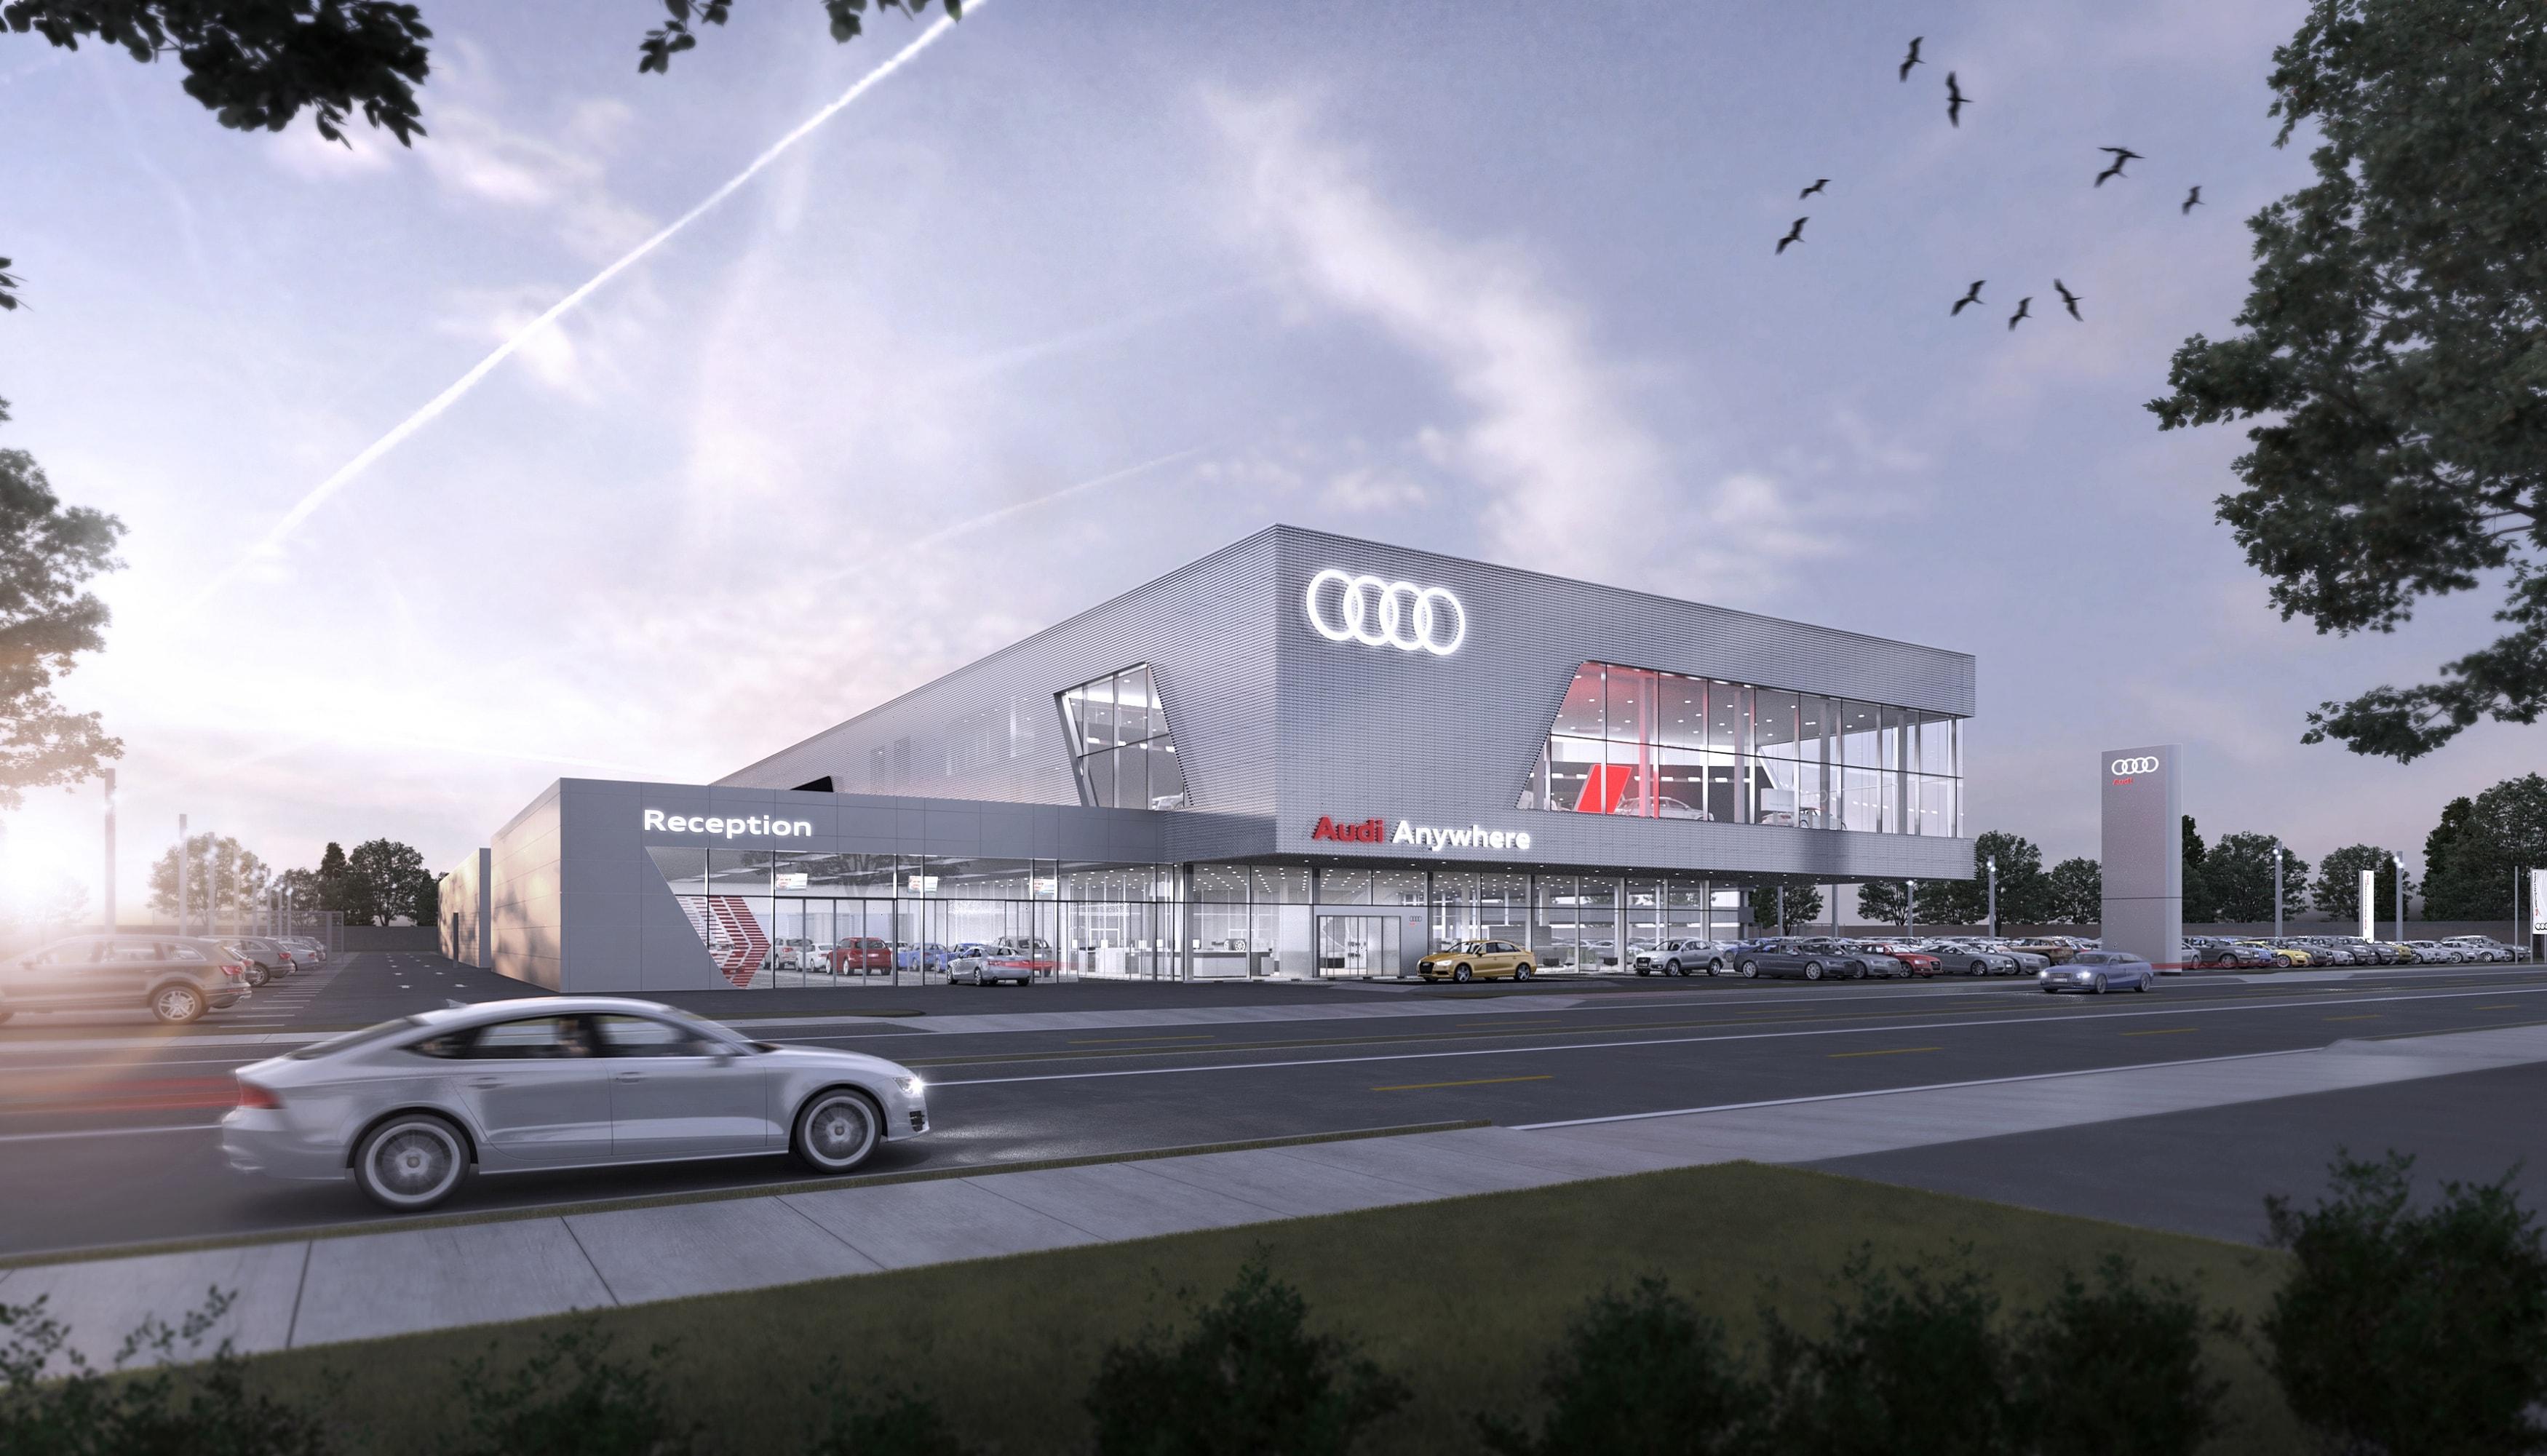 Audi Allentown New Audi Dealership In Allentown PA - Audi dealers pa